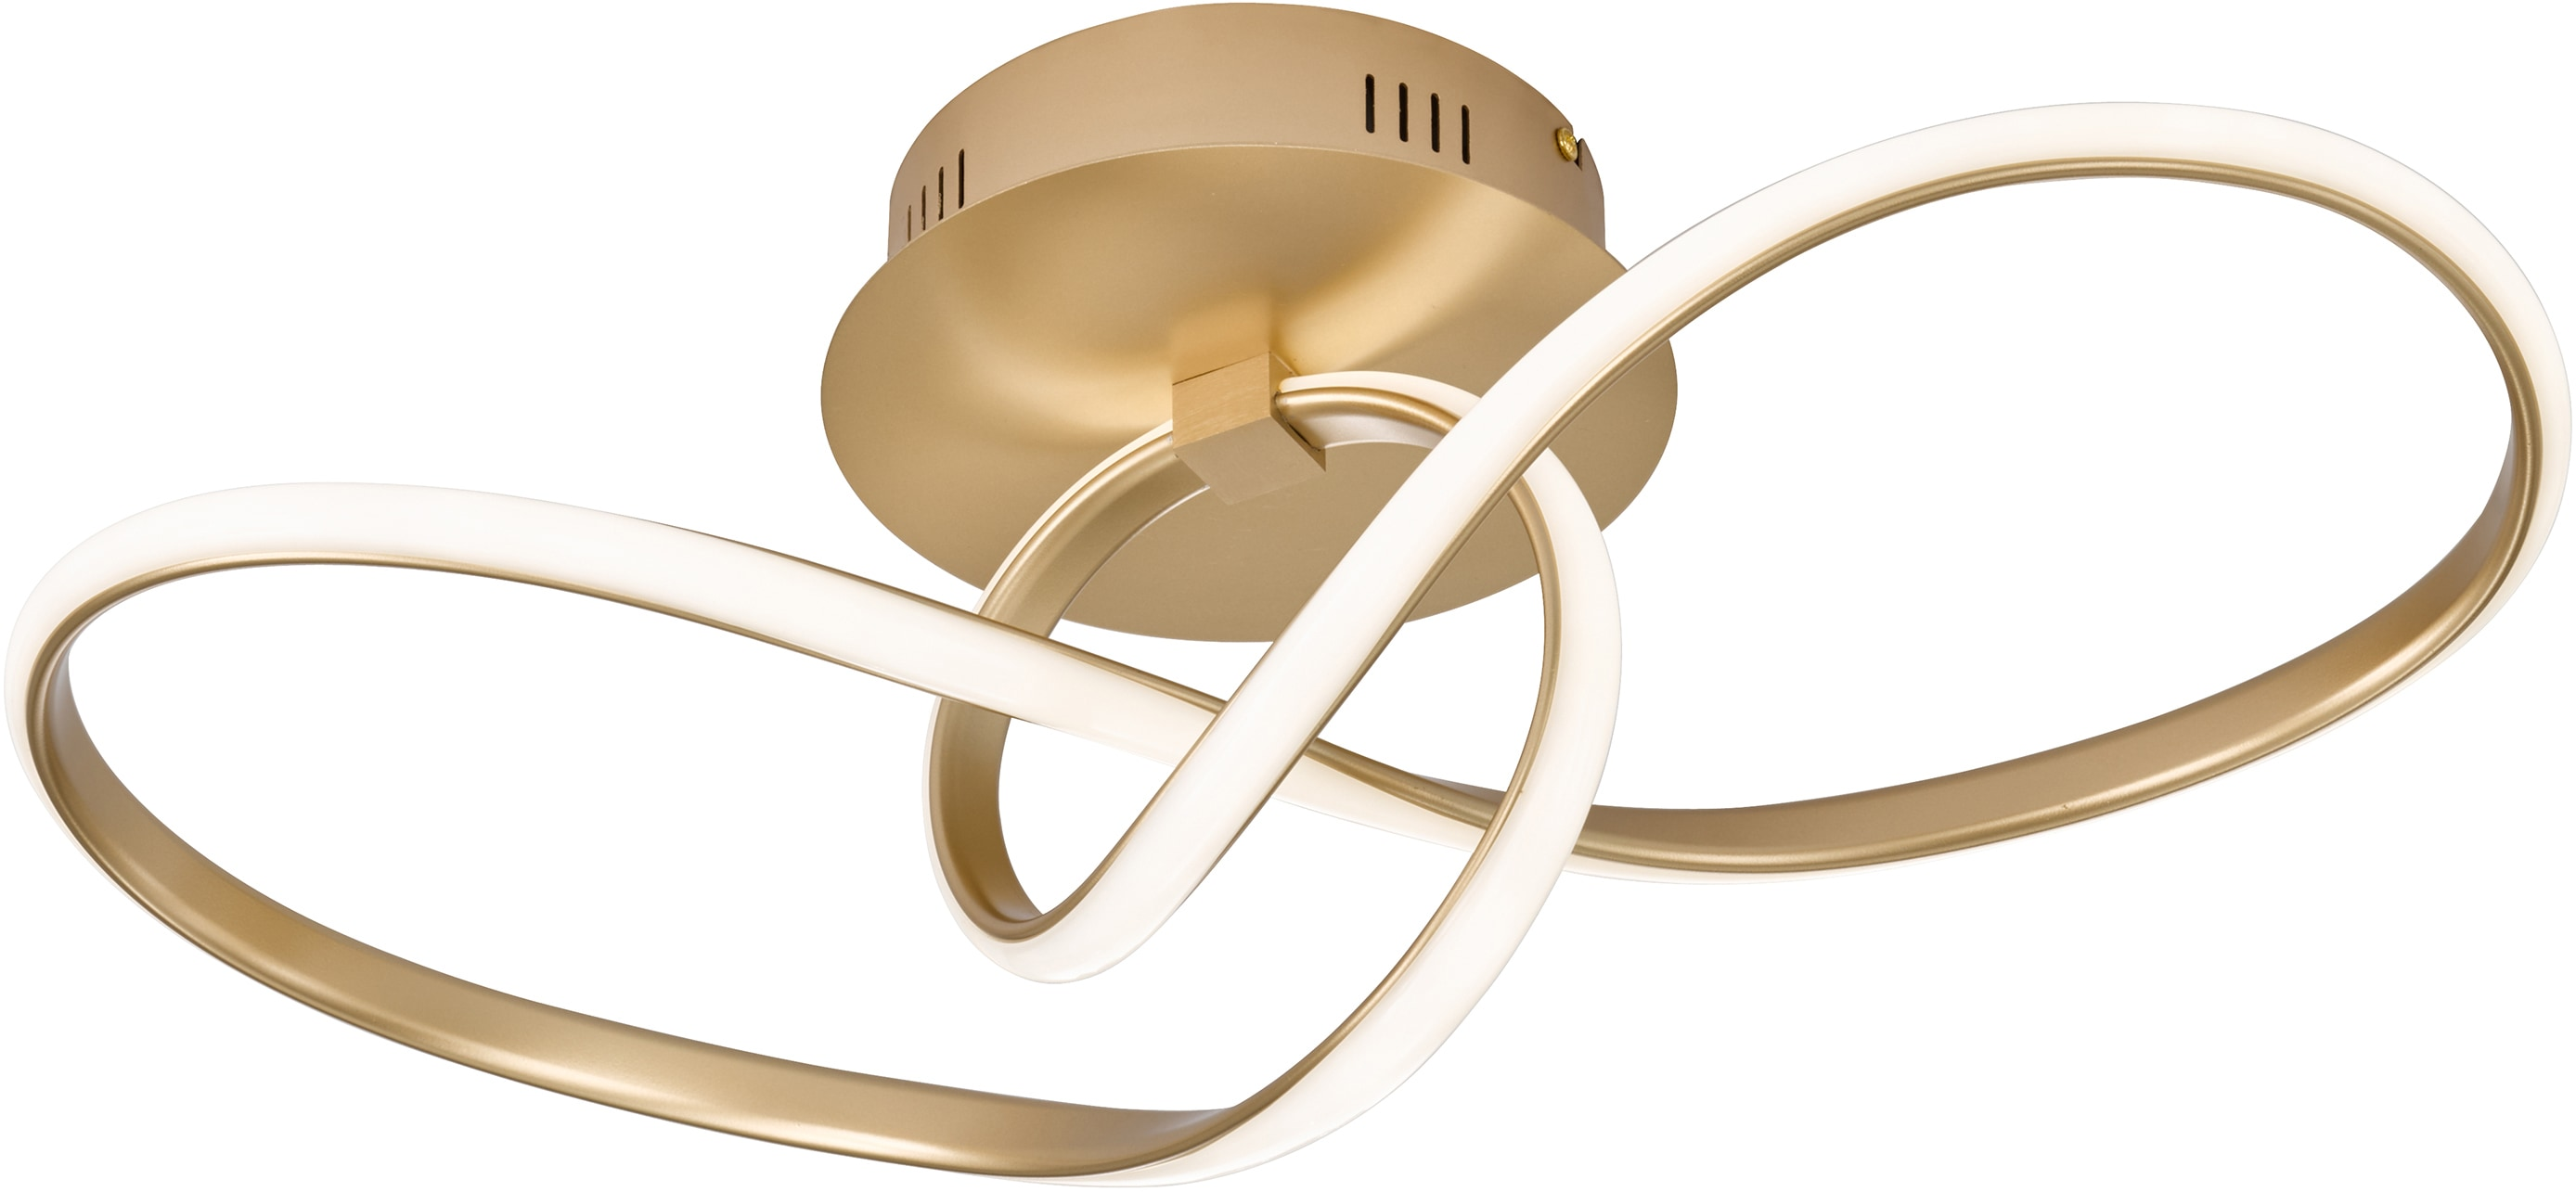 WOFI Deckenleuchte Jackson, LED-Modul